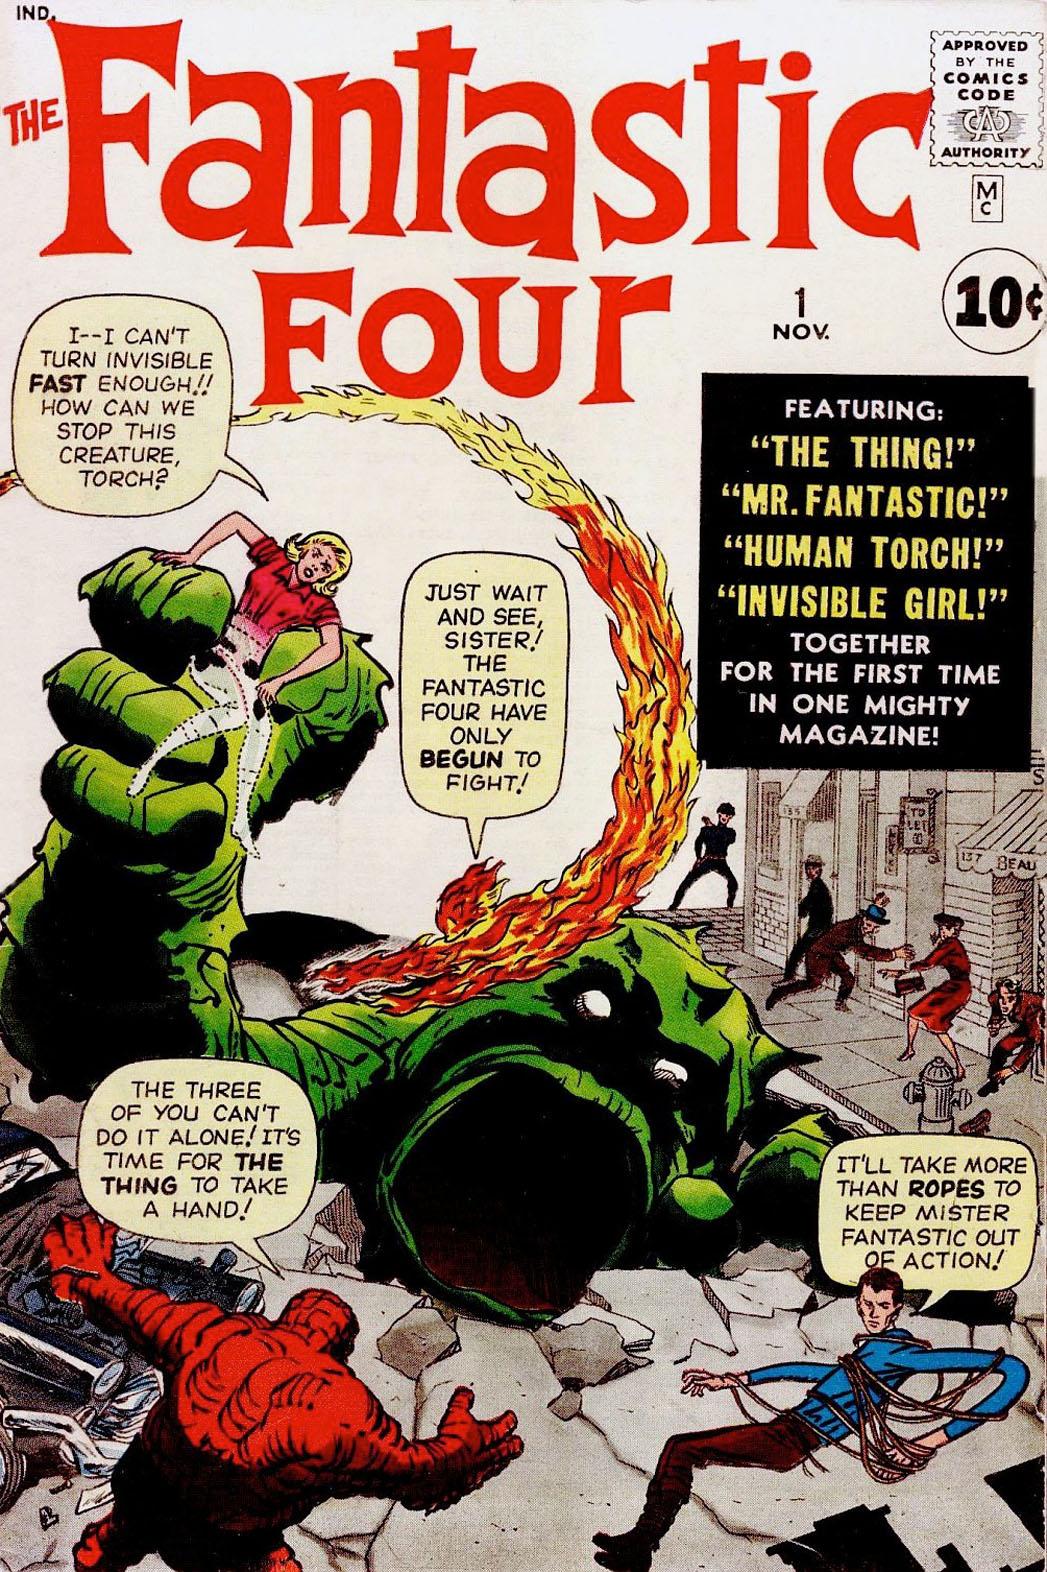 Fantastic Four 1 Cover - P 2014